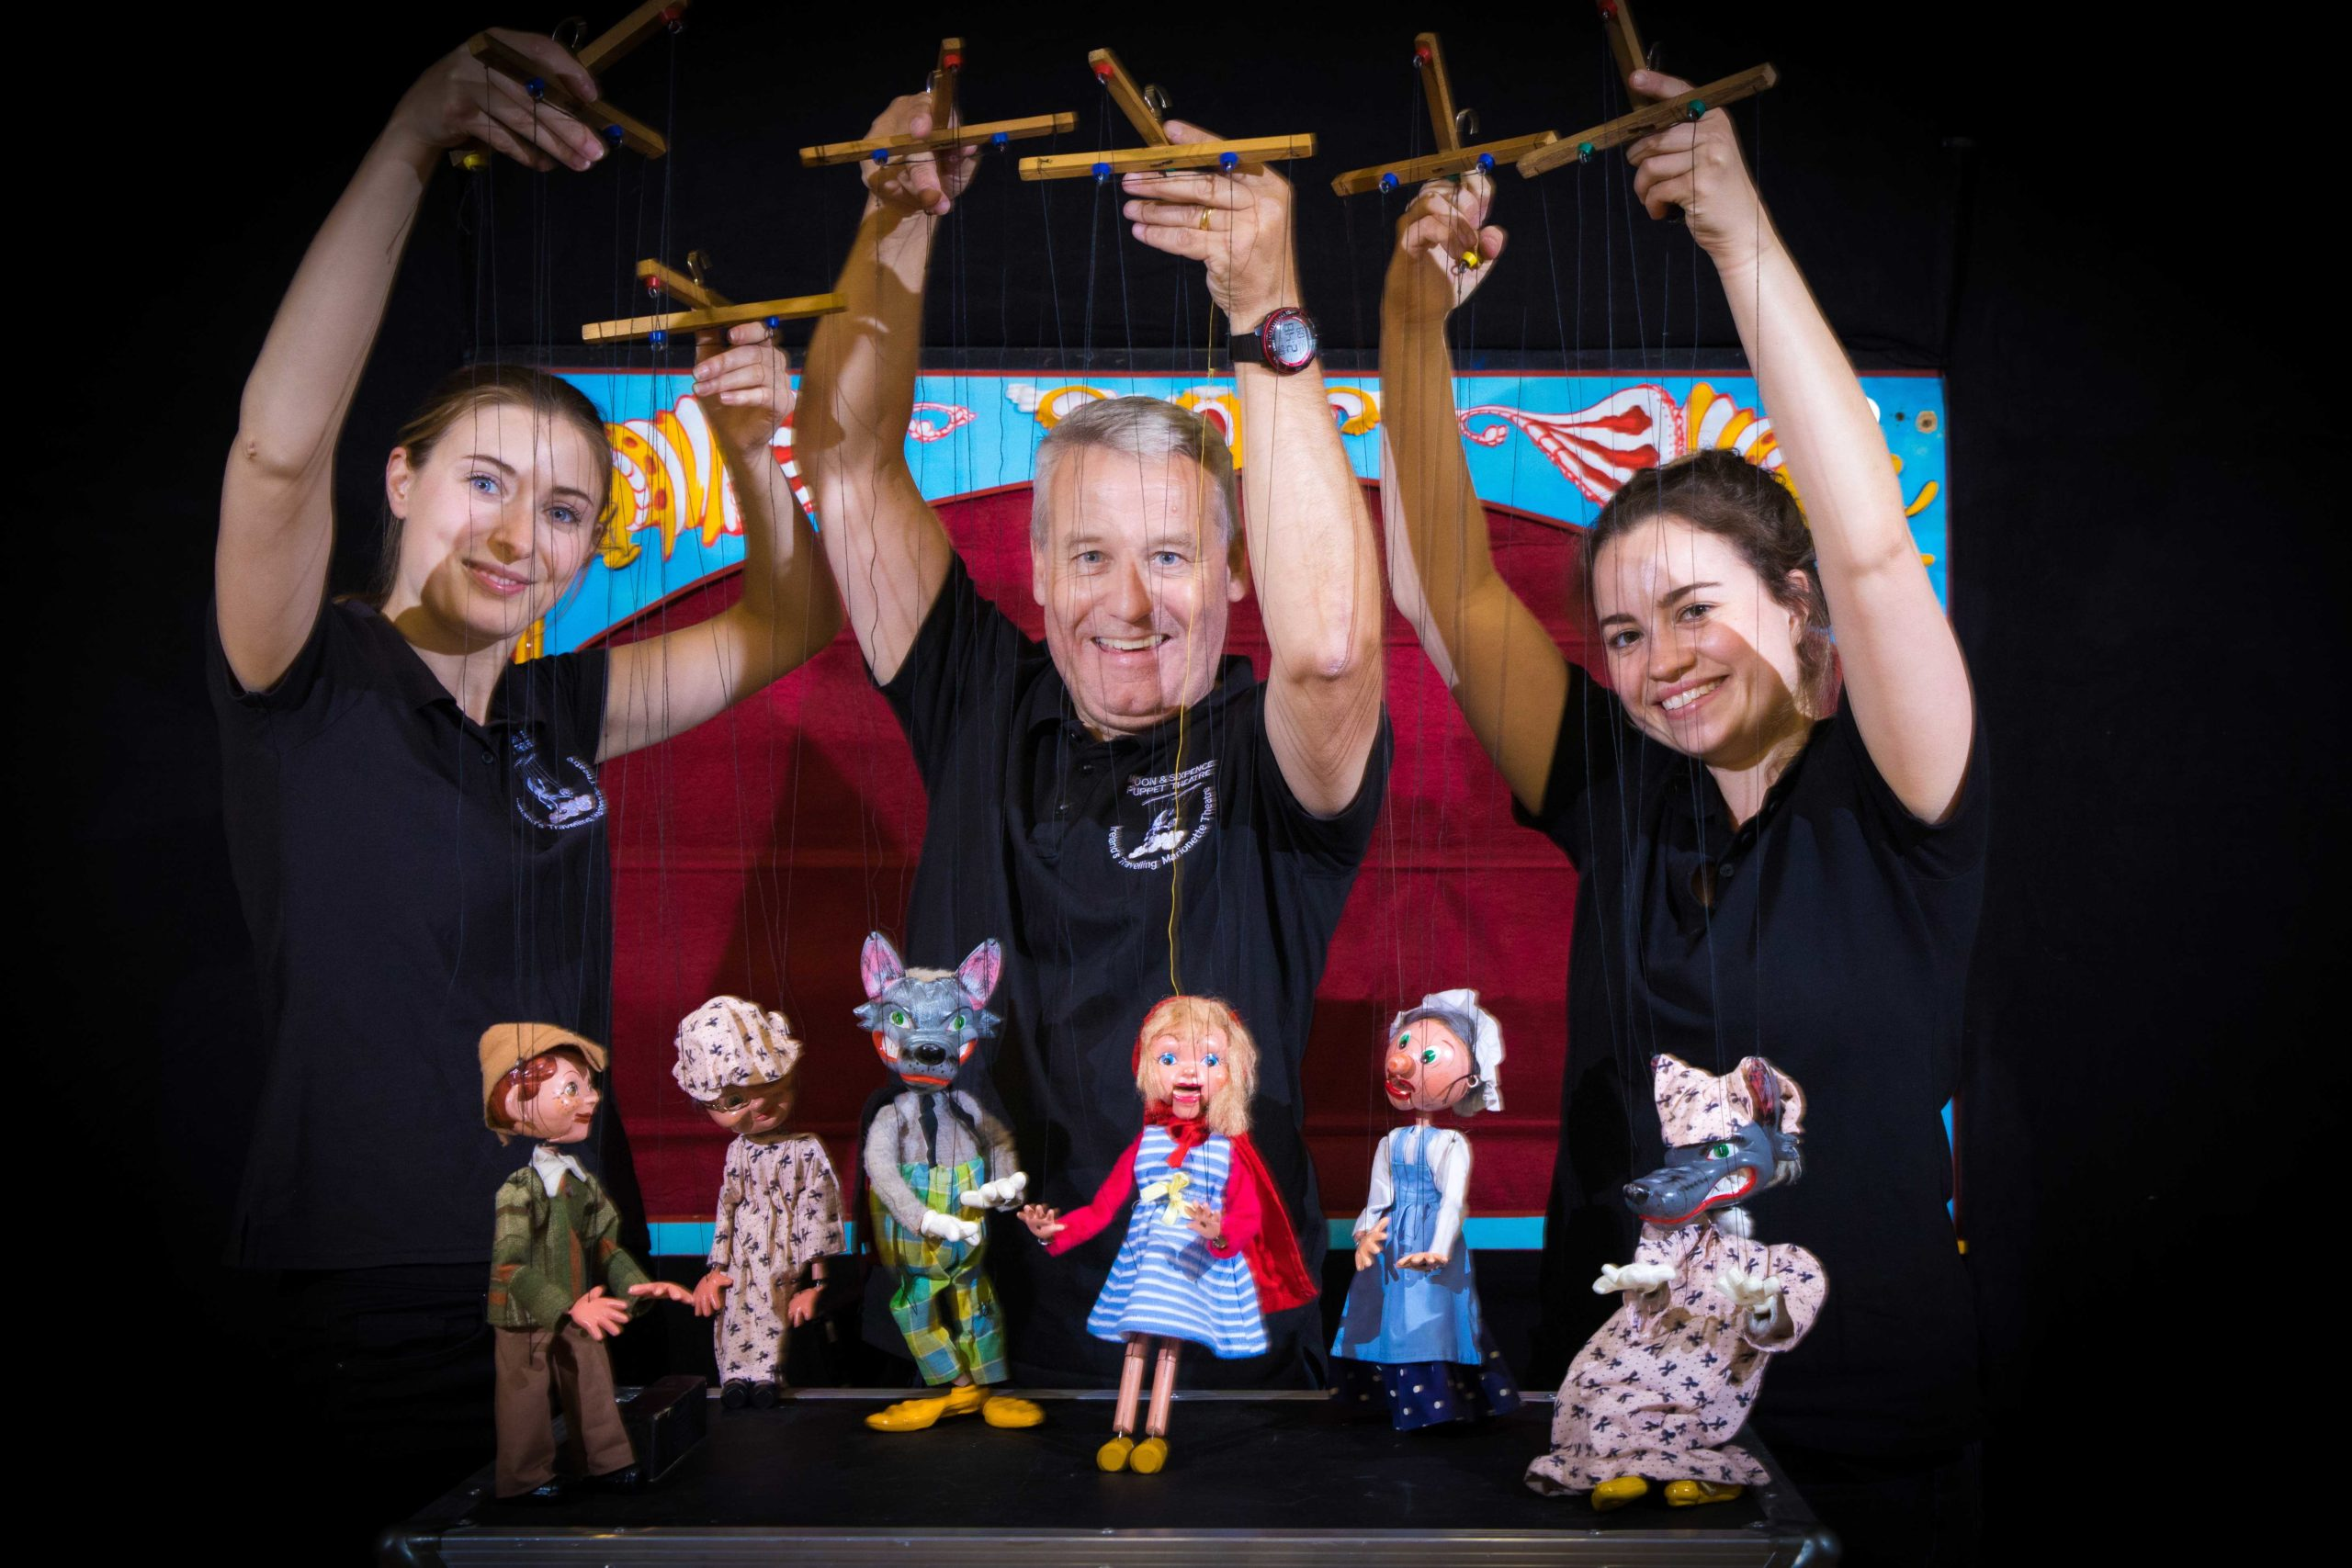 Puppeteers Ciara, Martin & Grainne